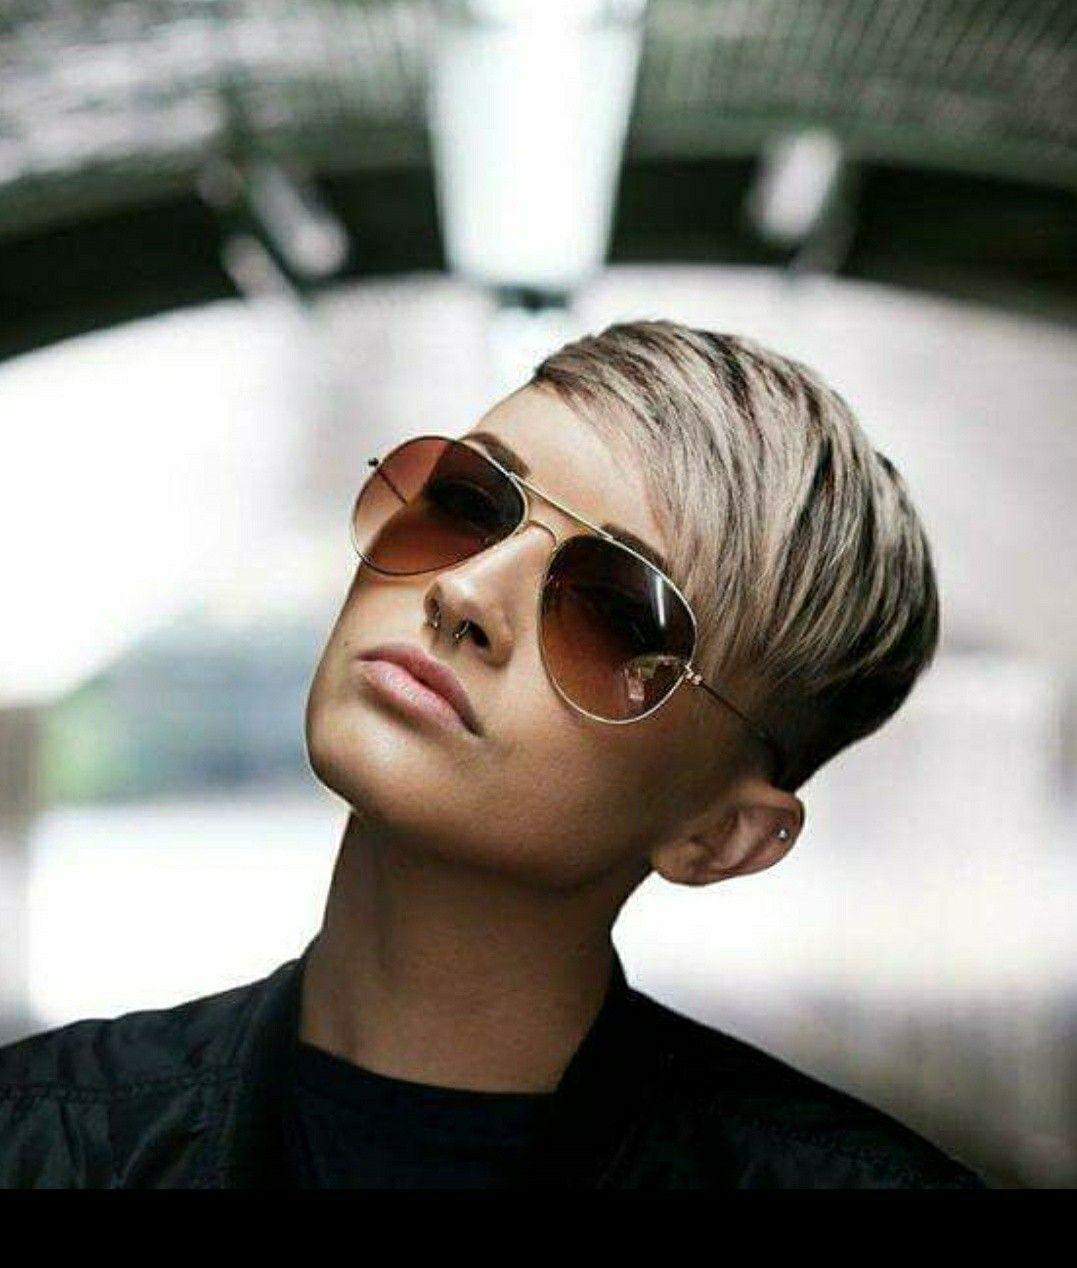 Pin By Nanda Matser On Hair Super Short Hair Short Hair Styles Pixie Short Hair Styles